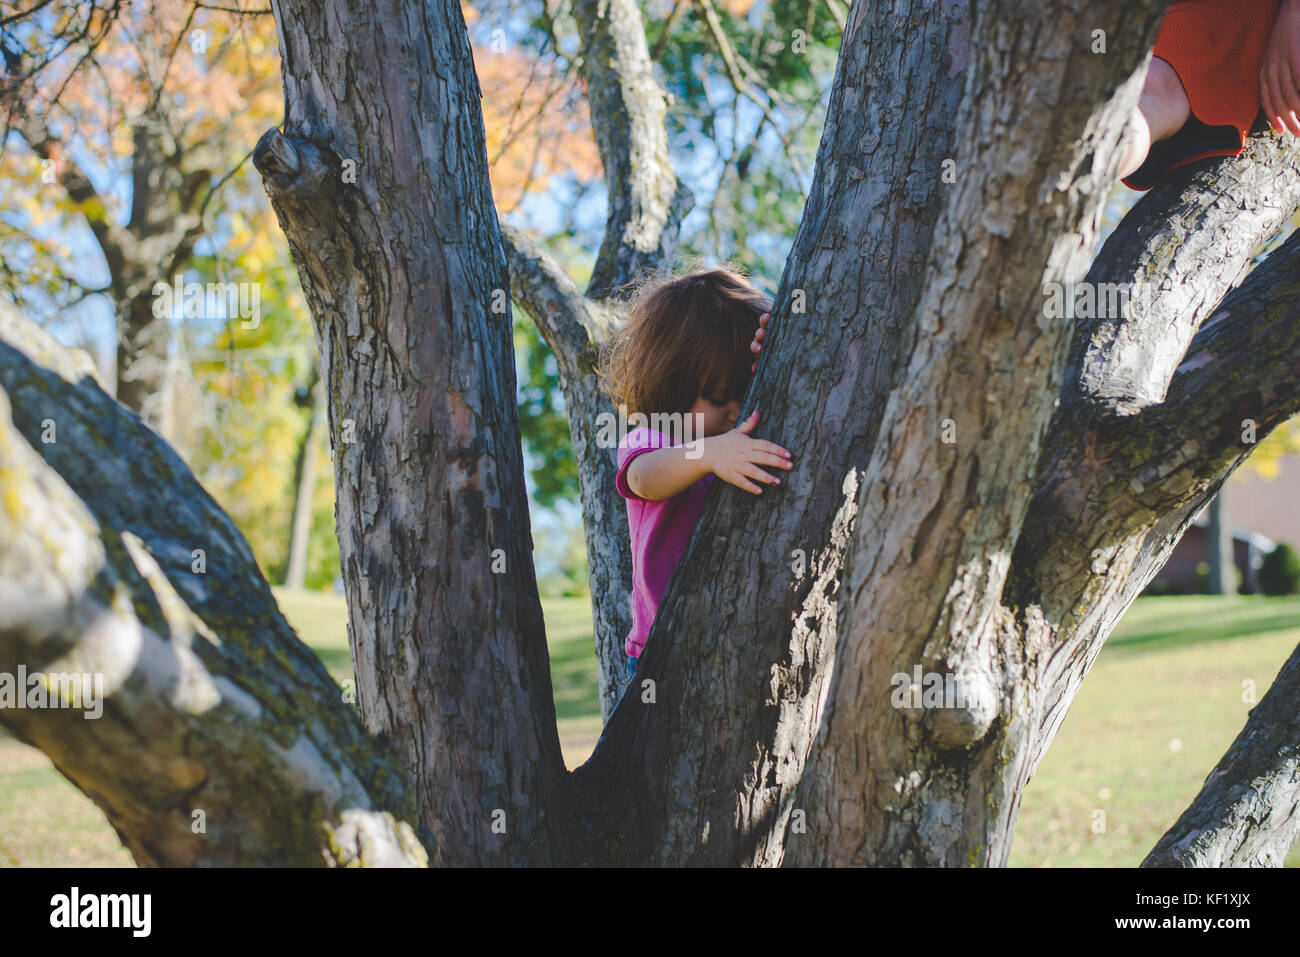 Child climbing a tree - Stock Image